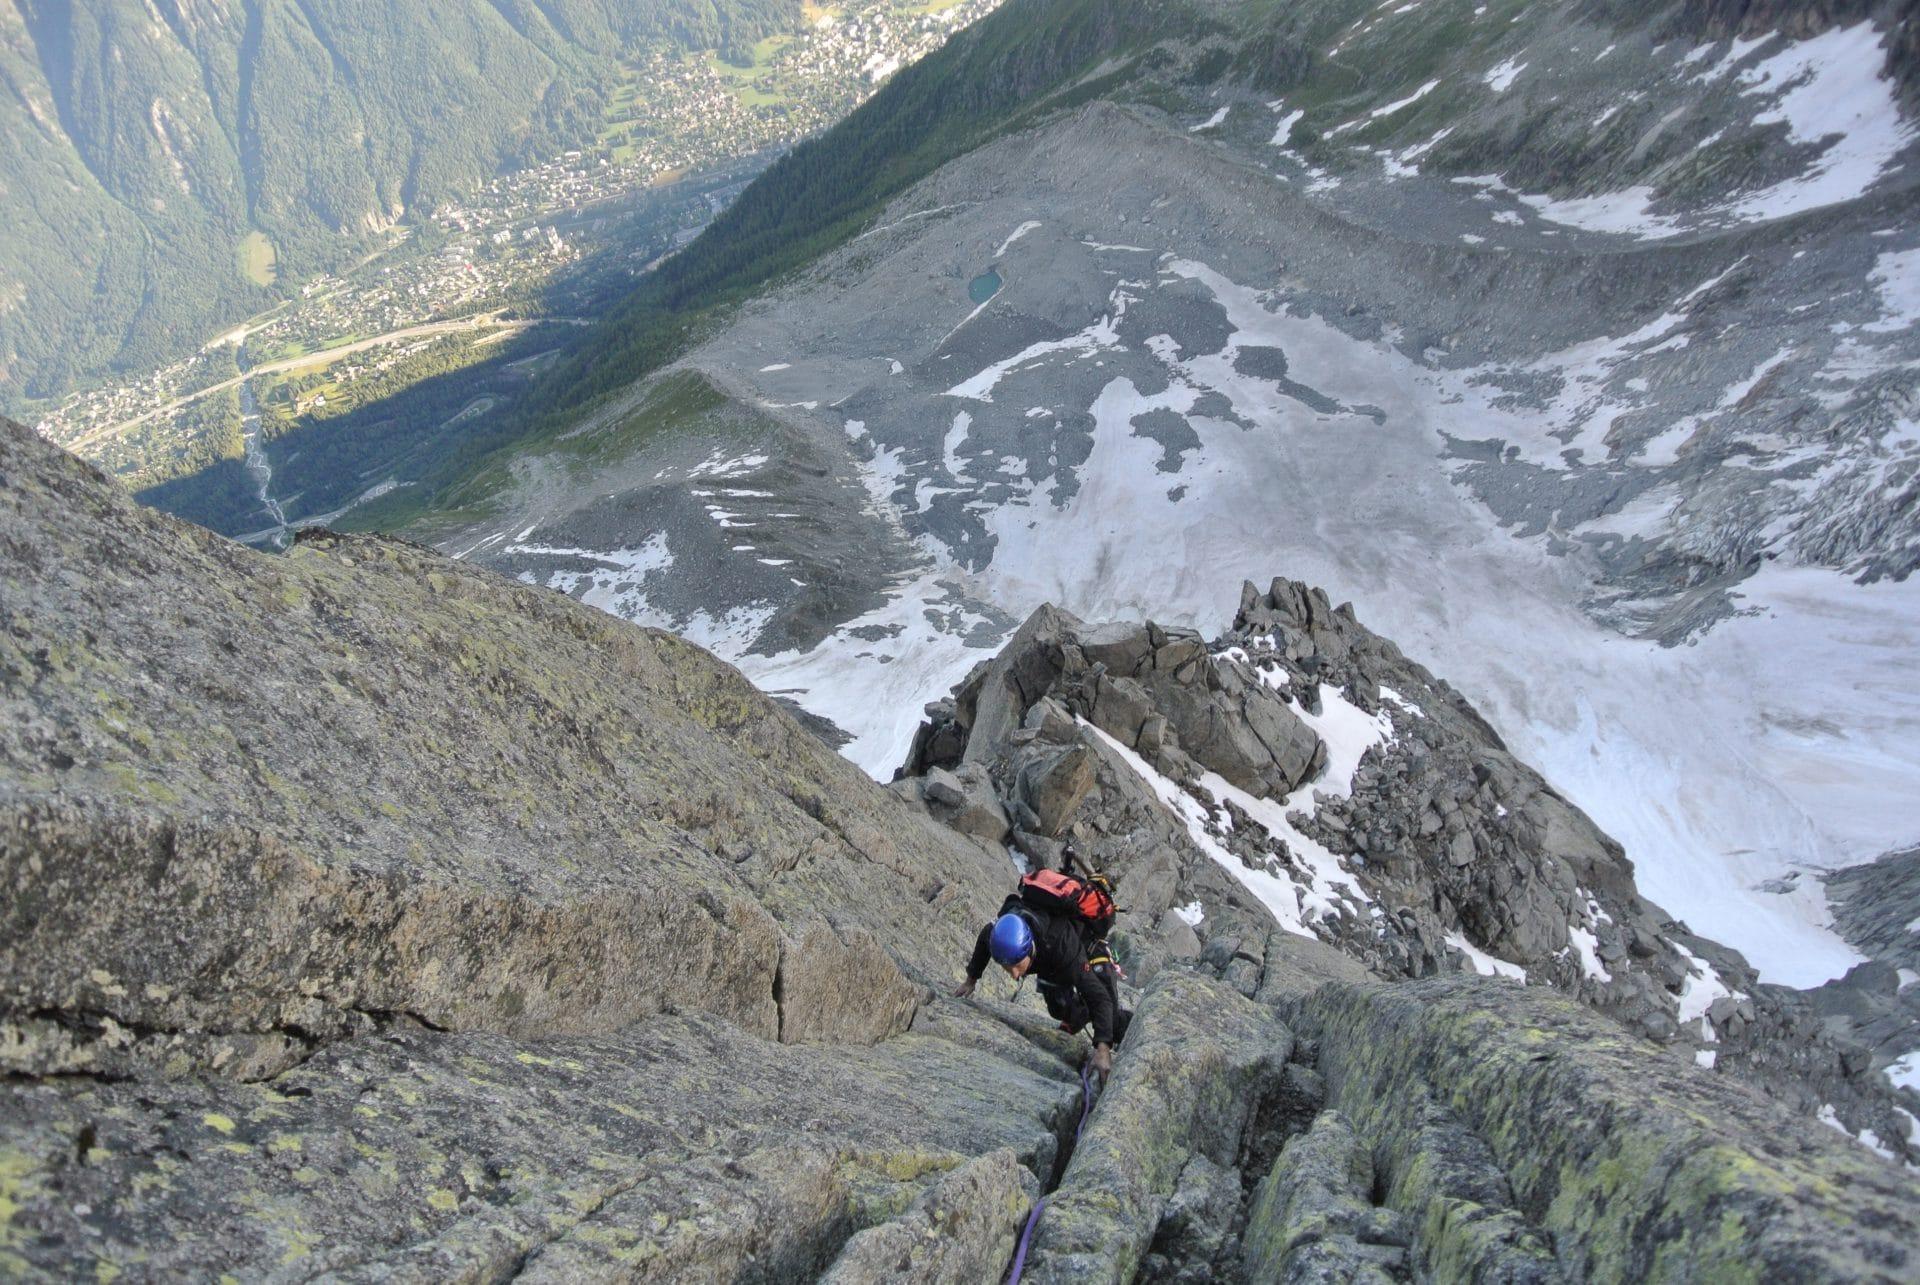 Helyum_Xavier-Carrard_Eperon-Frendo_Alpinisme_Aiguille-du-midi_France_3